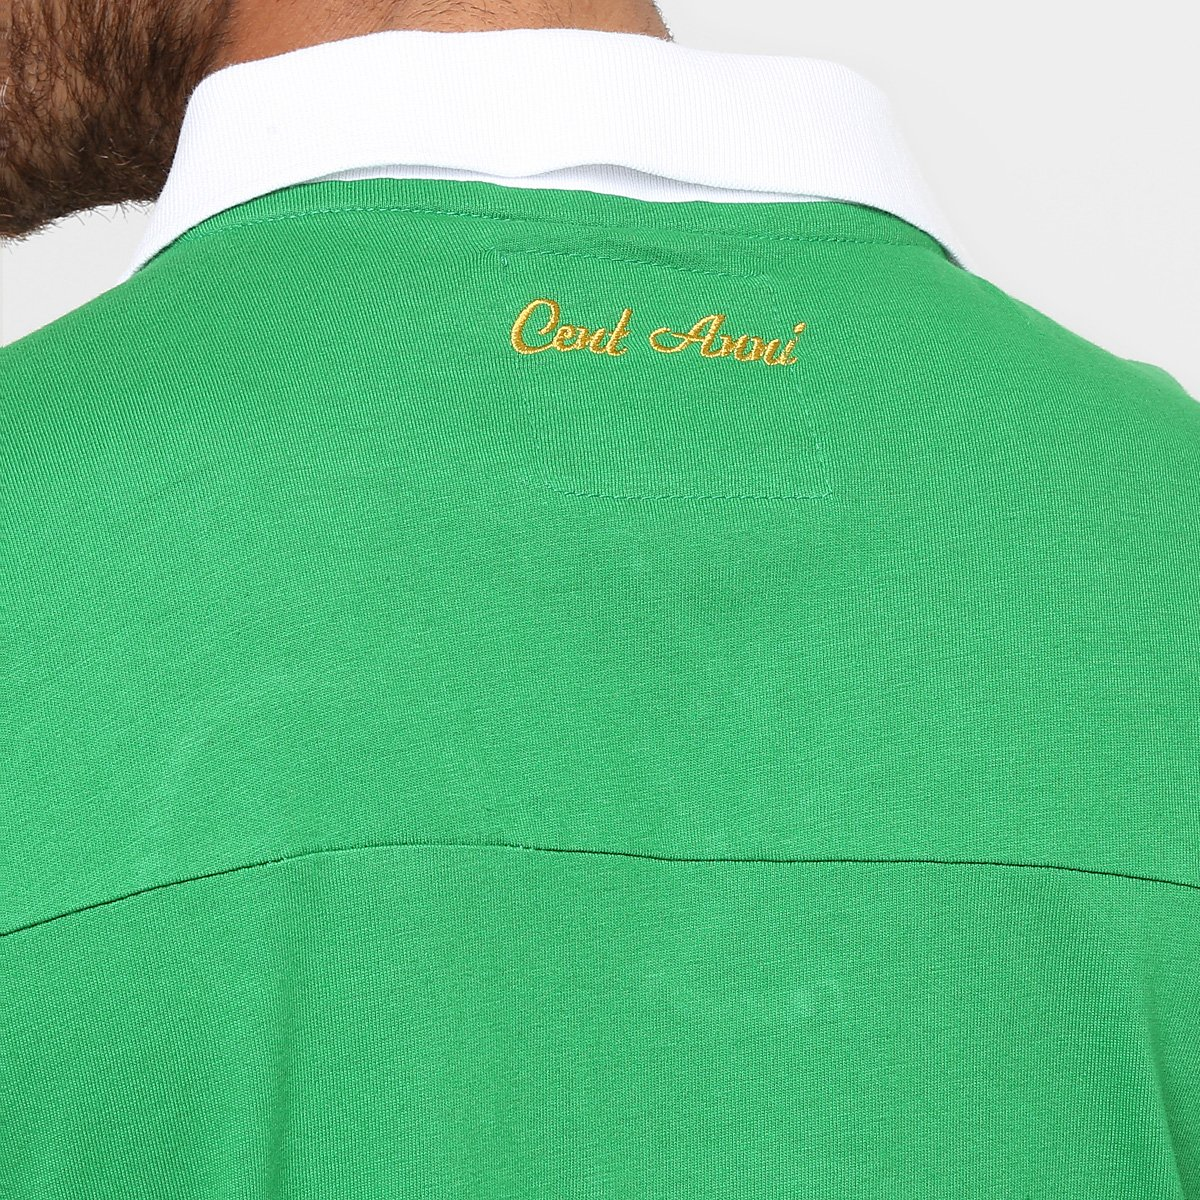 810150d4dd Camisa Polo Palmeiras Marcos Alviverde Retrô - Compre Agora